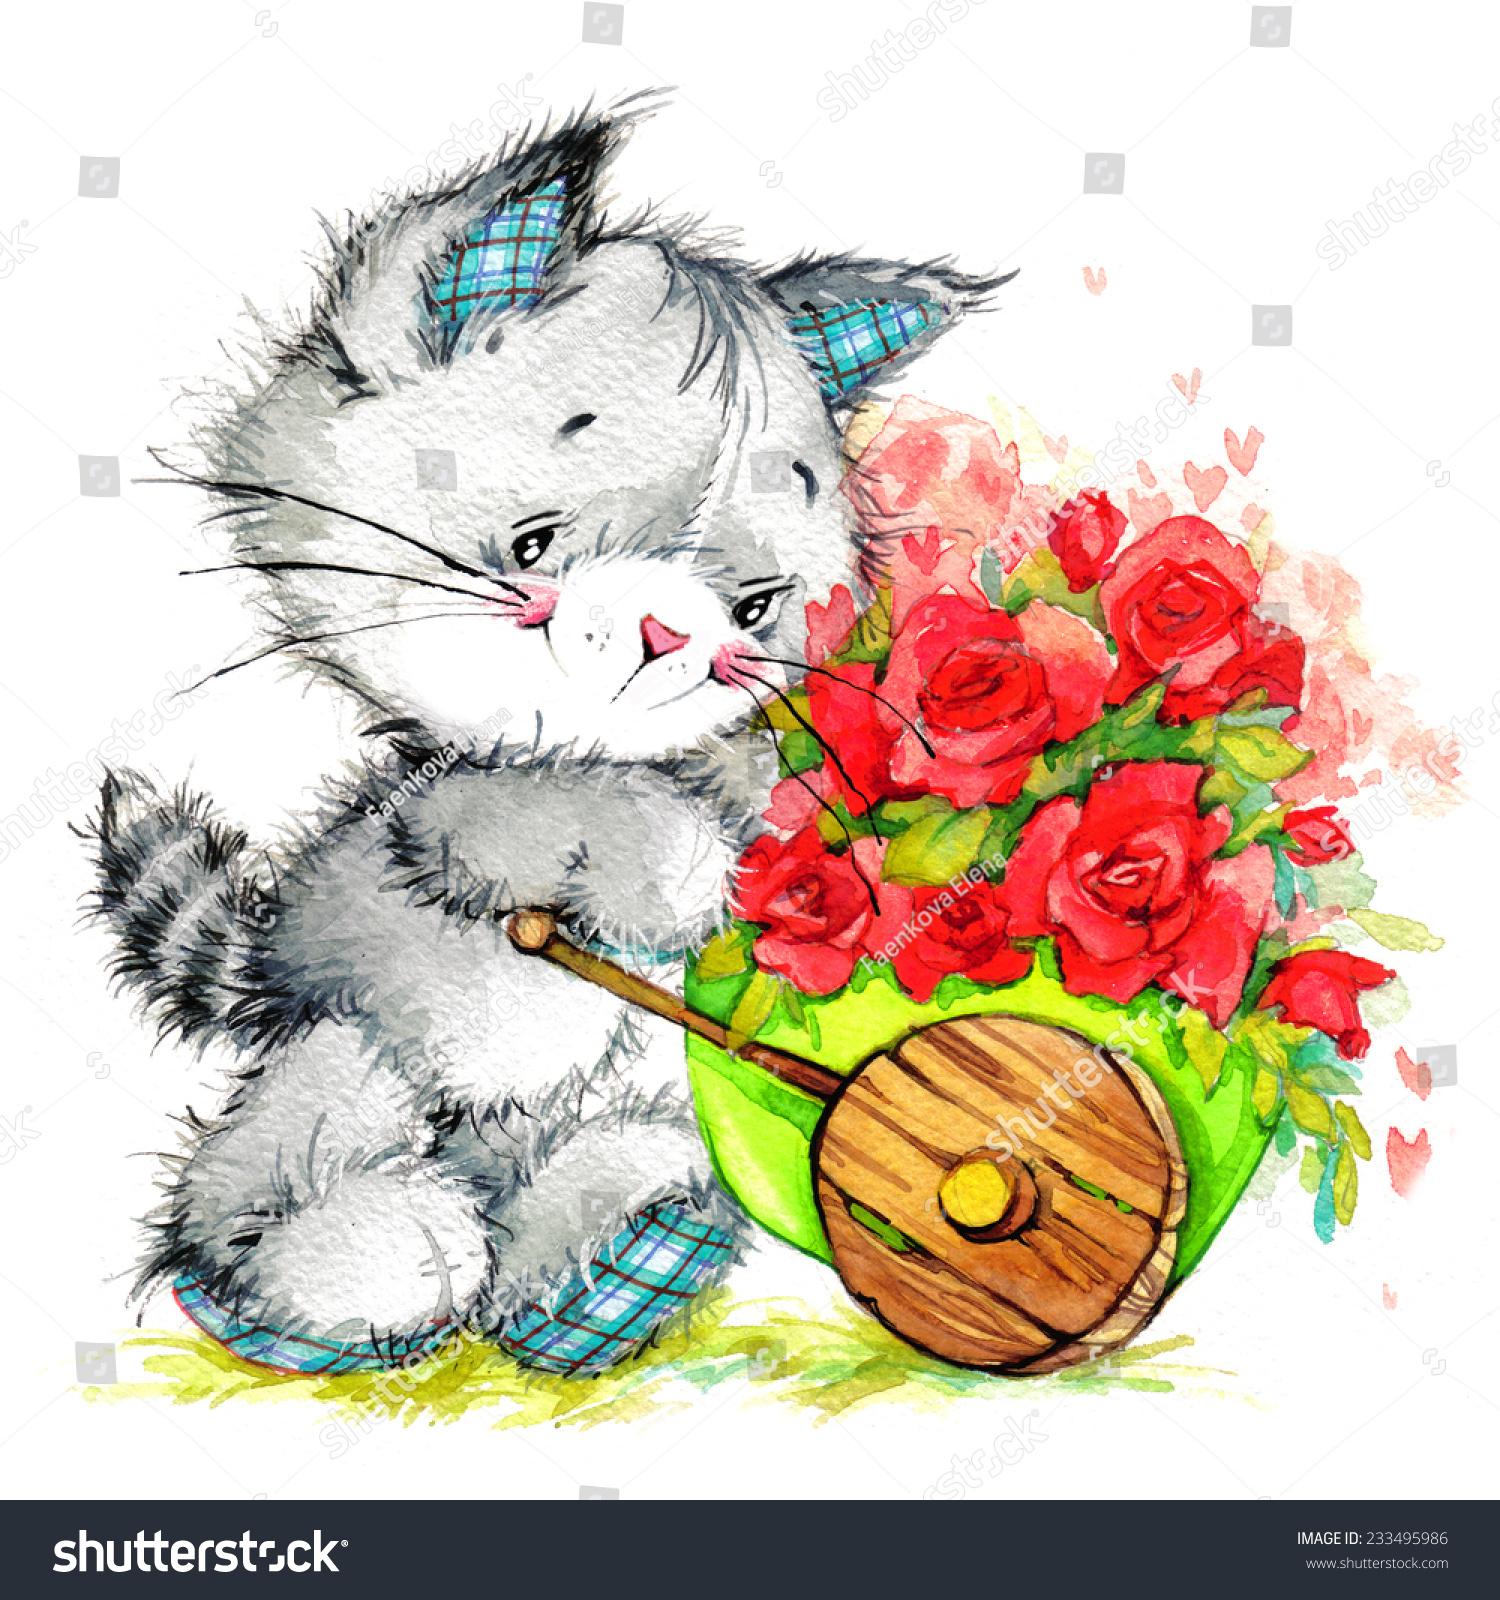 Kitten Flowers Delivery Celebrate Greetings Festival Stock ...